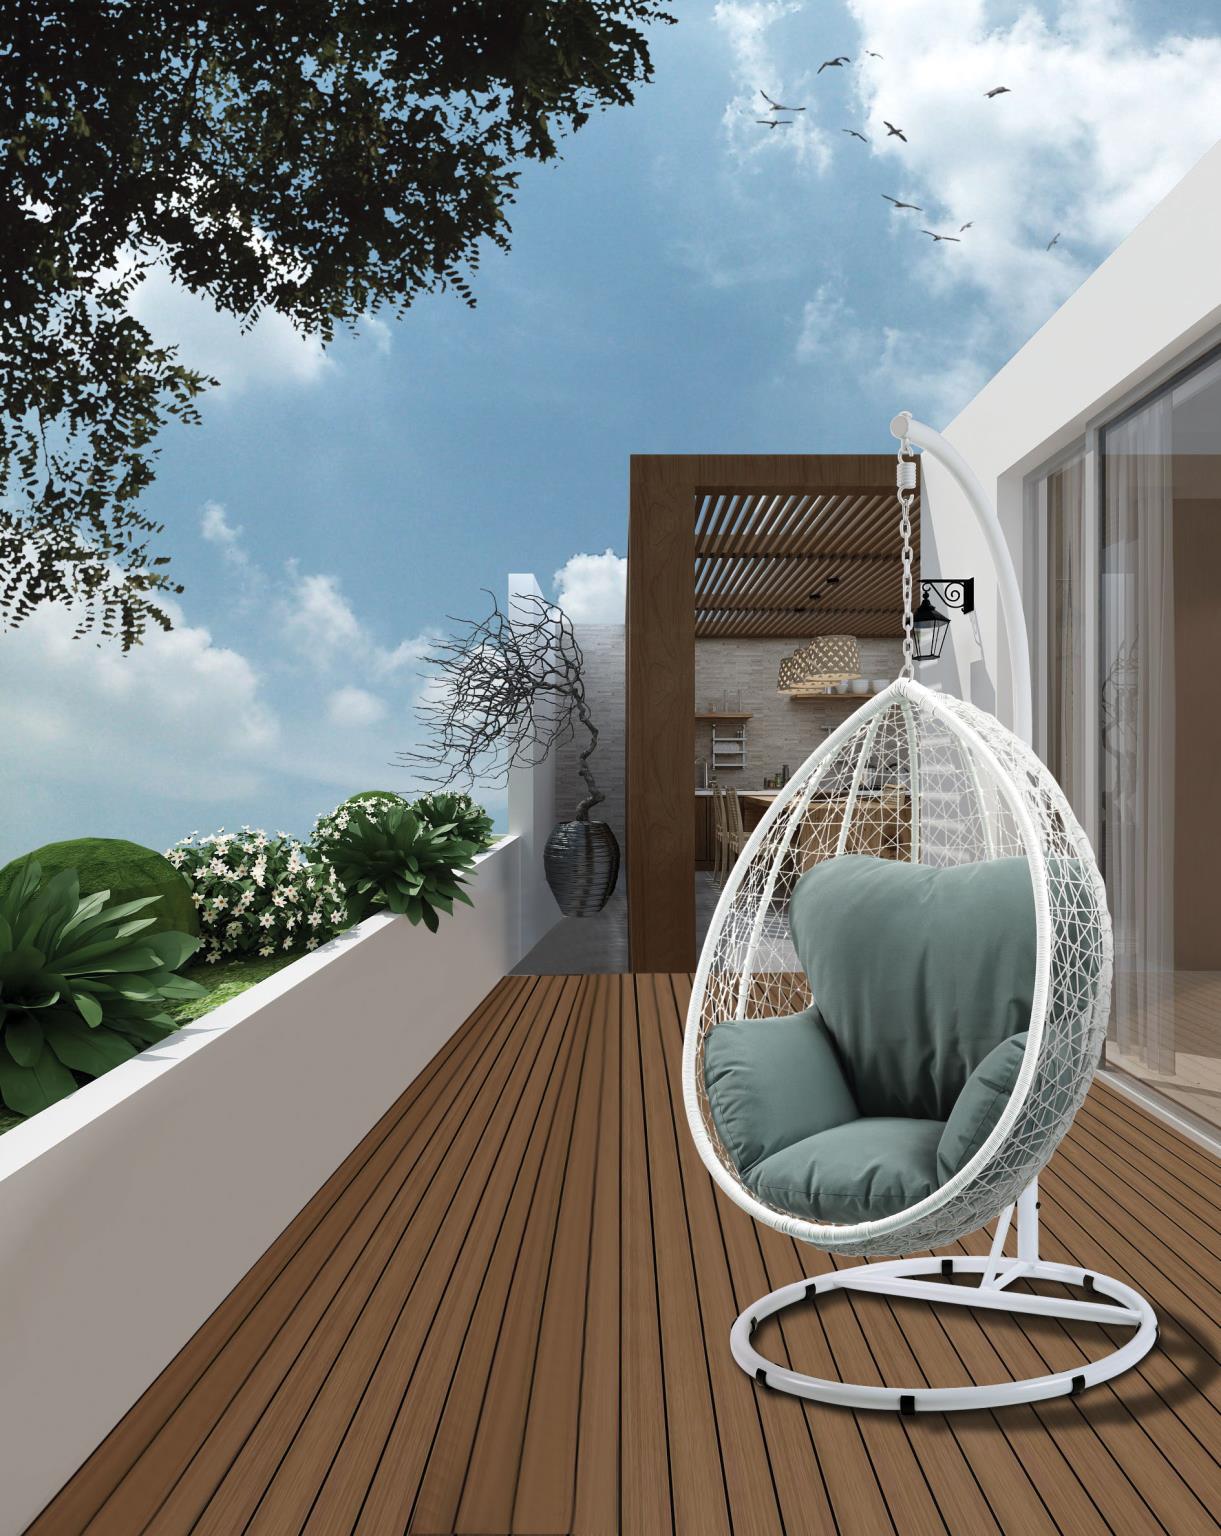 White Wicker Patio Swing Chair